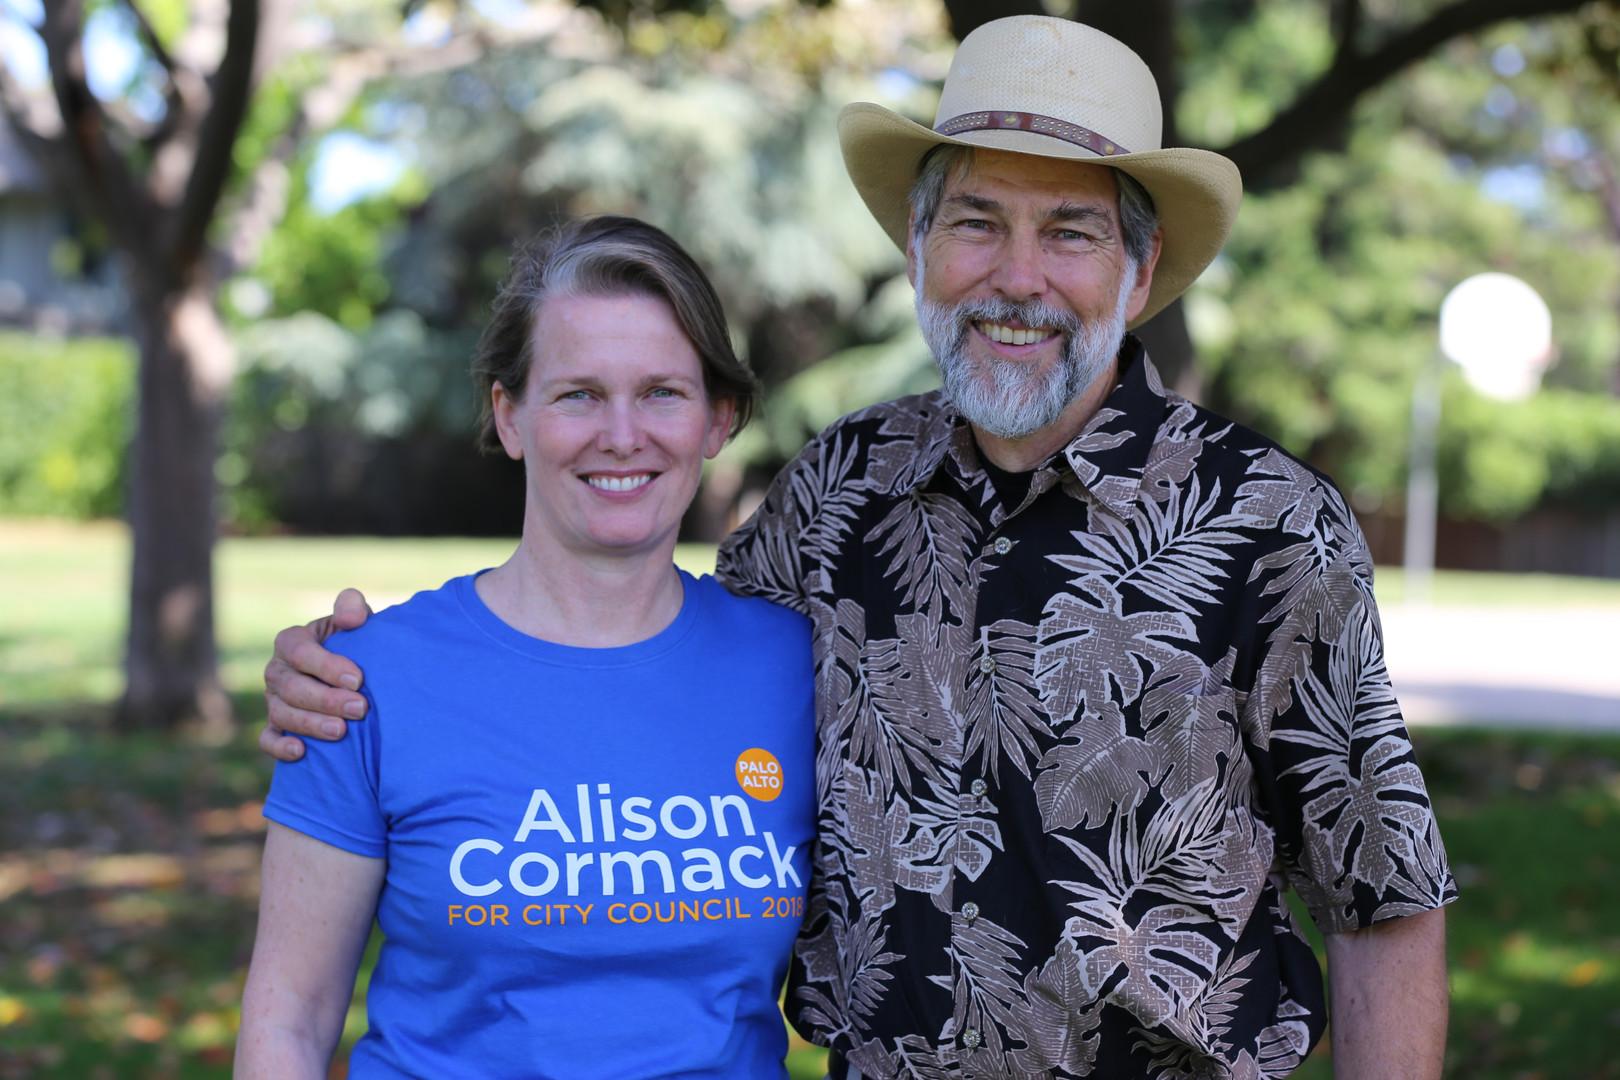 Bern Beecham and Alison Cormack